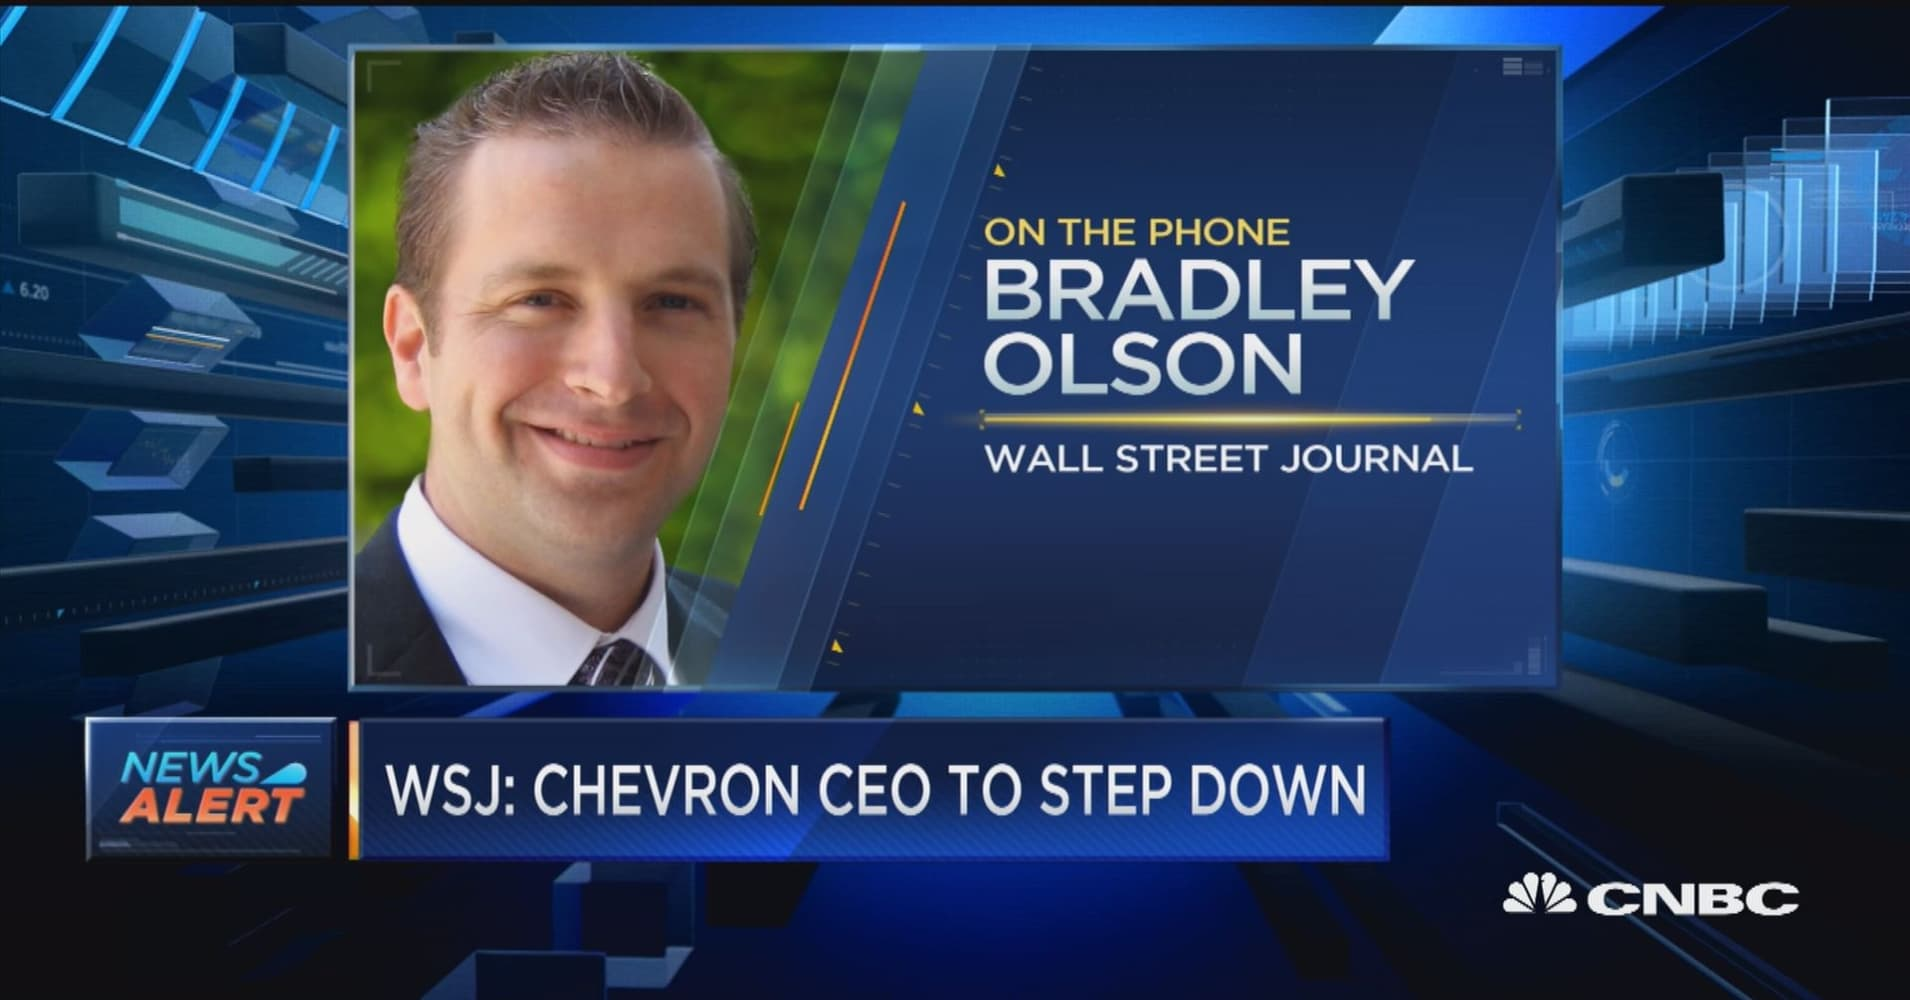 WSJ: Chevron CEO to step down